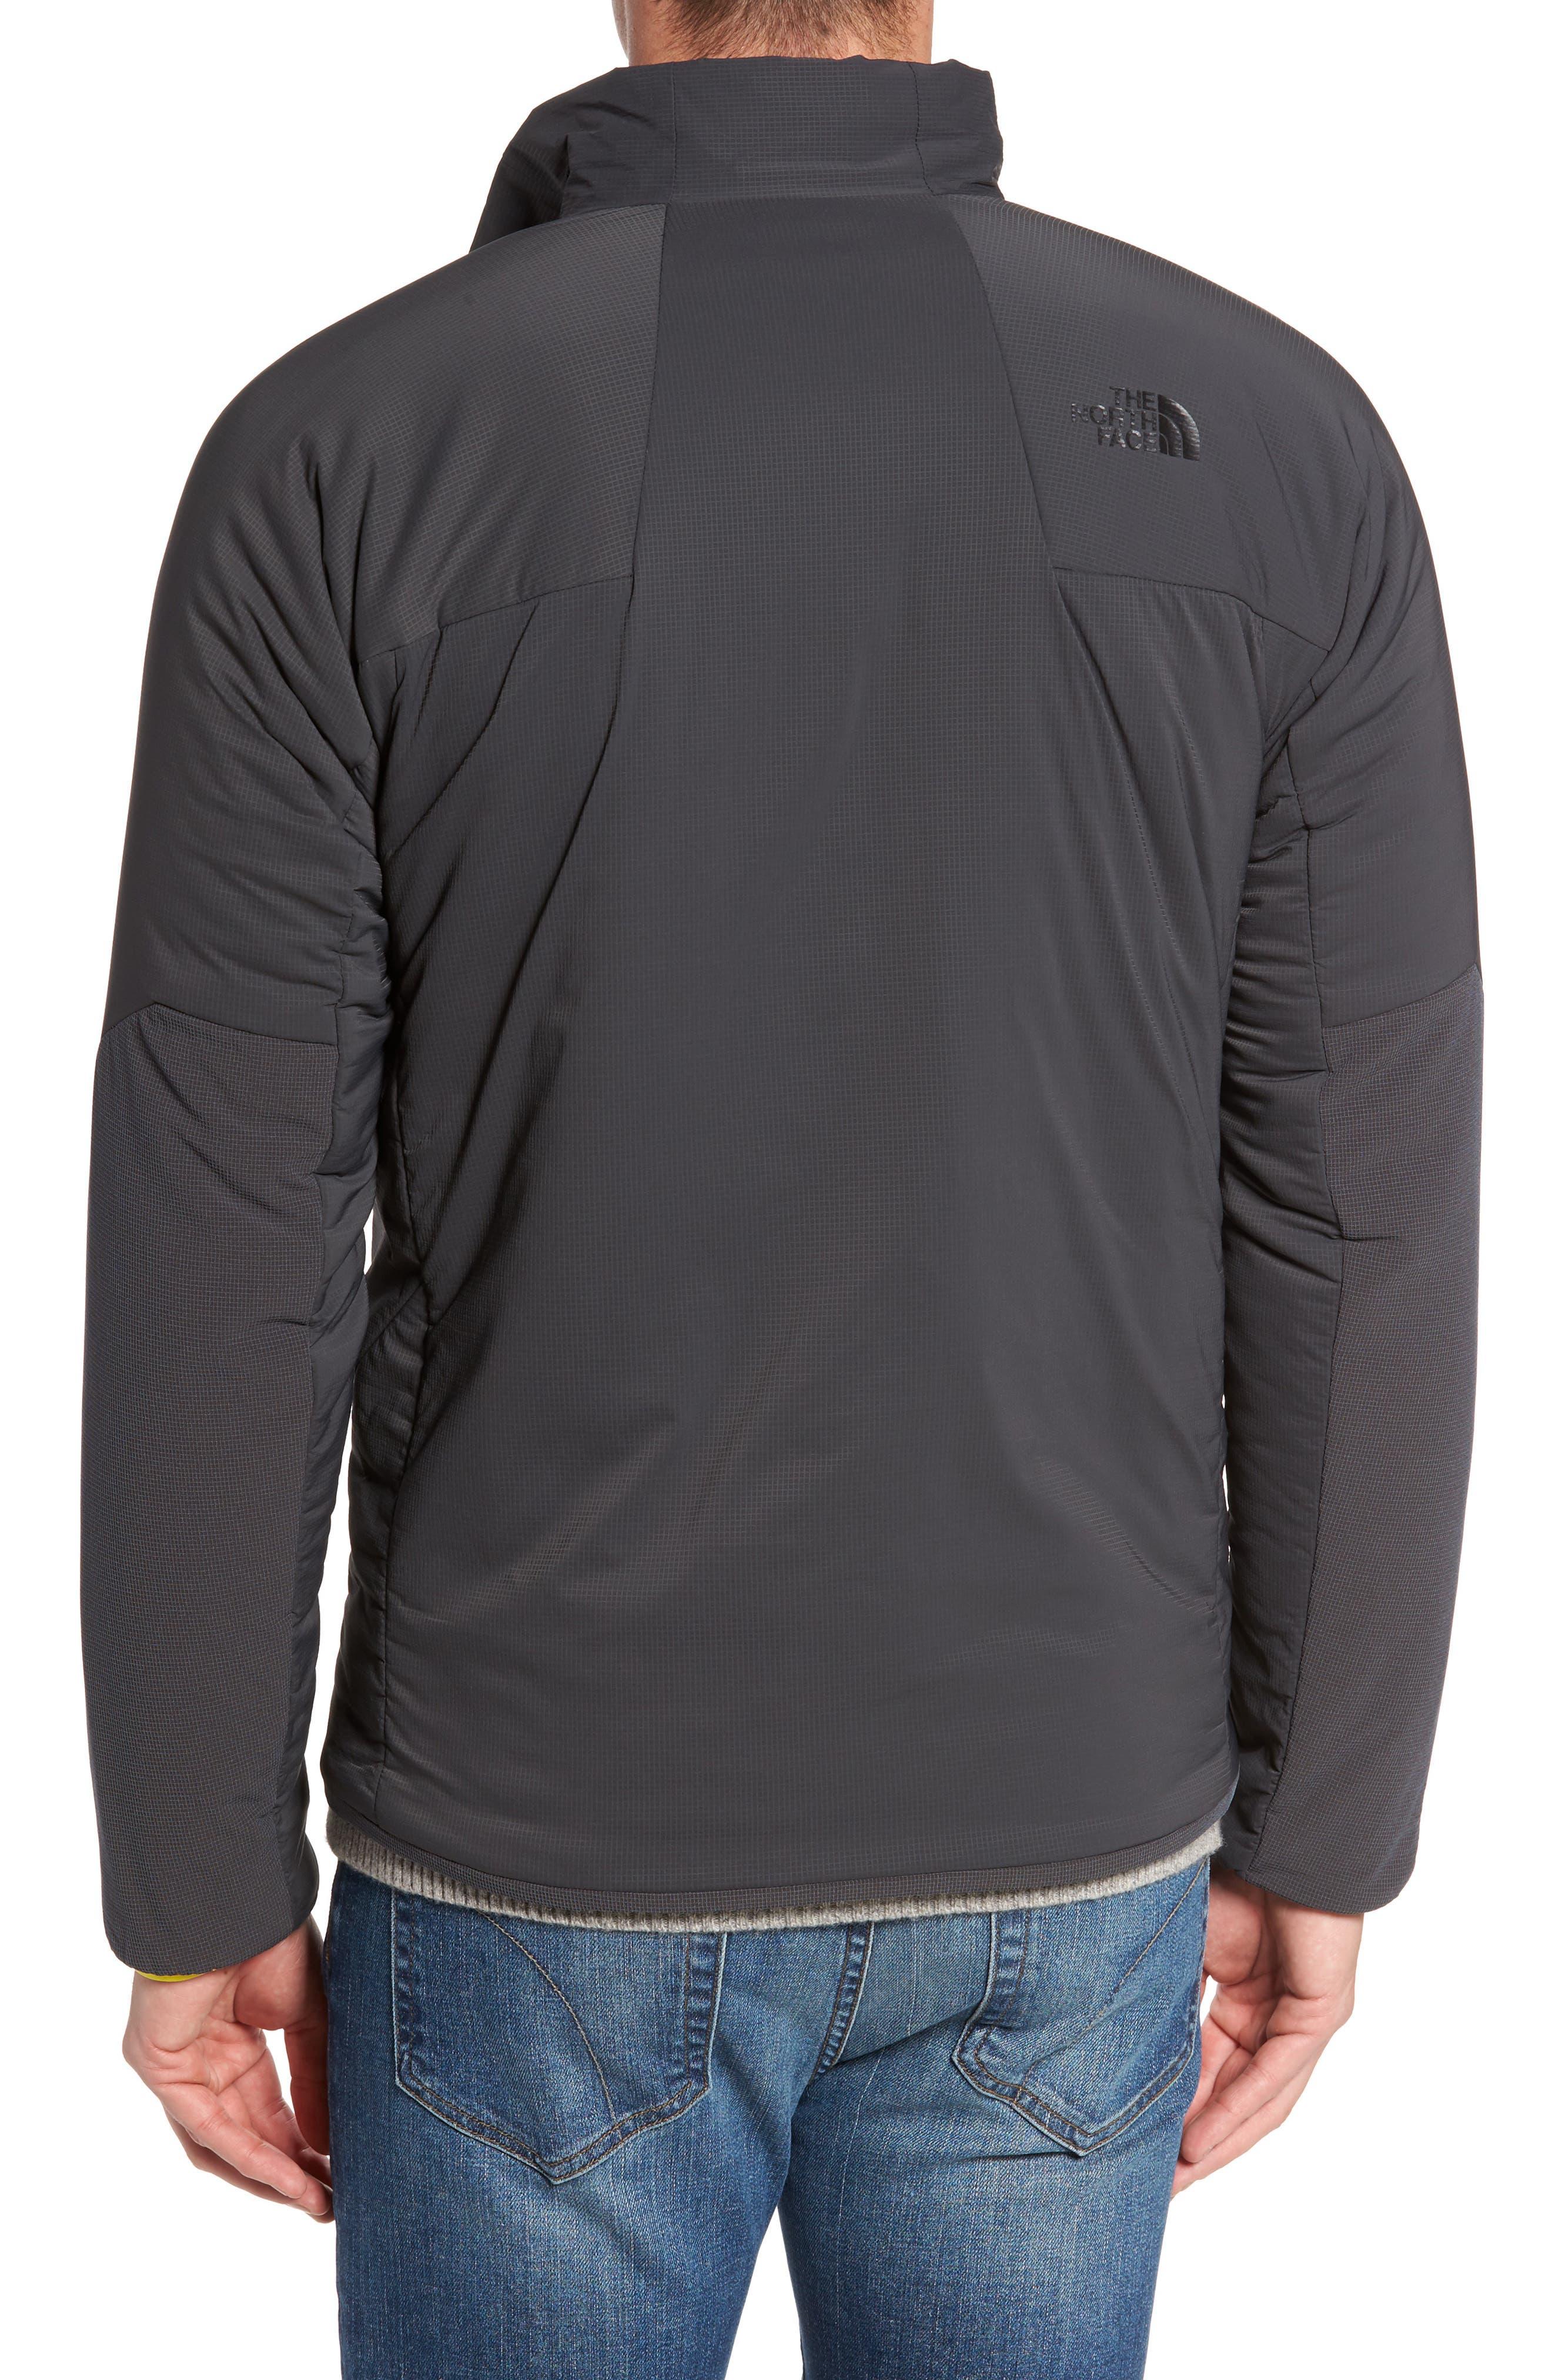 Ventrix Water Resistant Ripstop Jacket,                             Alternate thumbnail 2, color,                             Asphalt Grey / Acid Yellow